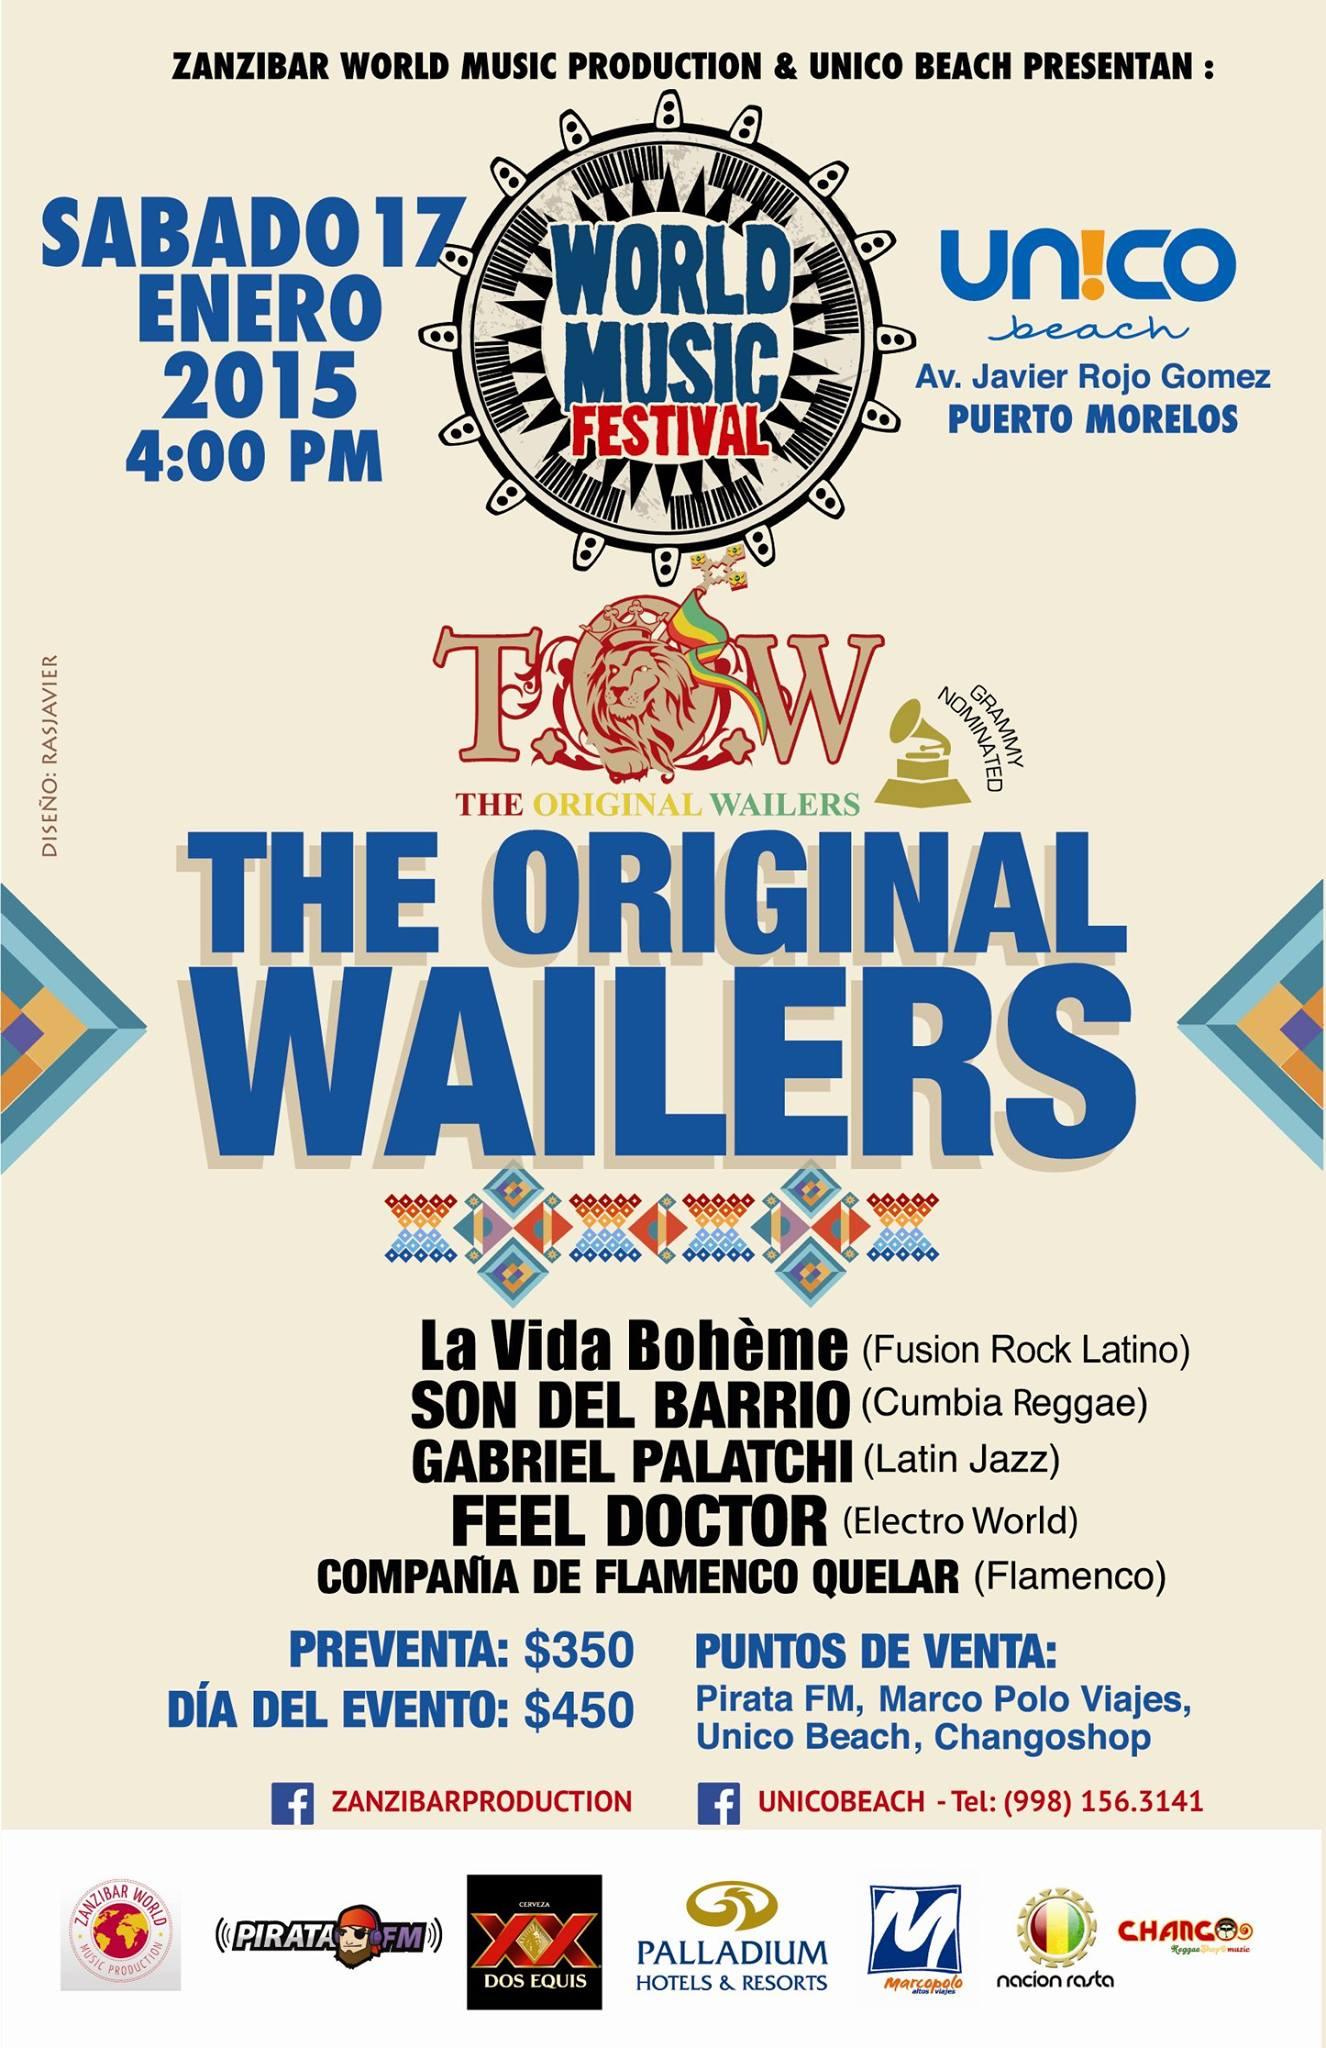 World Music Festival @ Unico Beach - Puerto Morelos